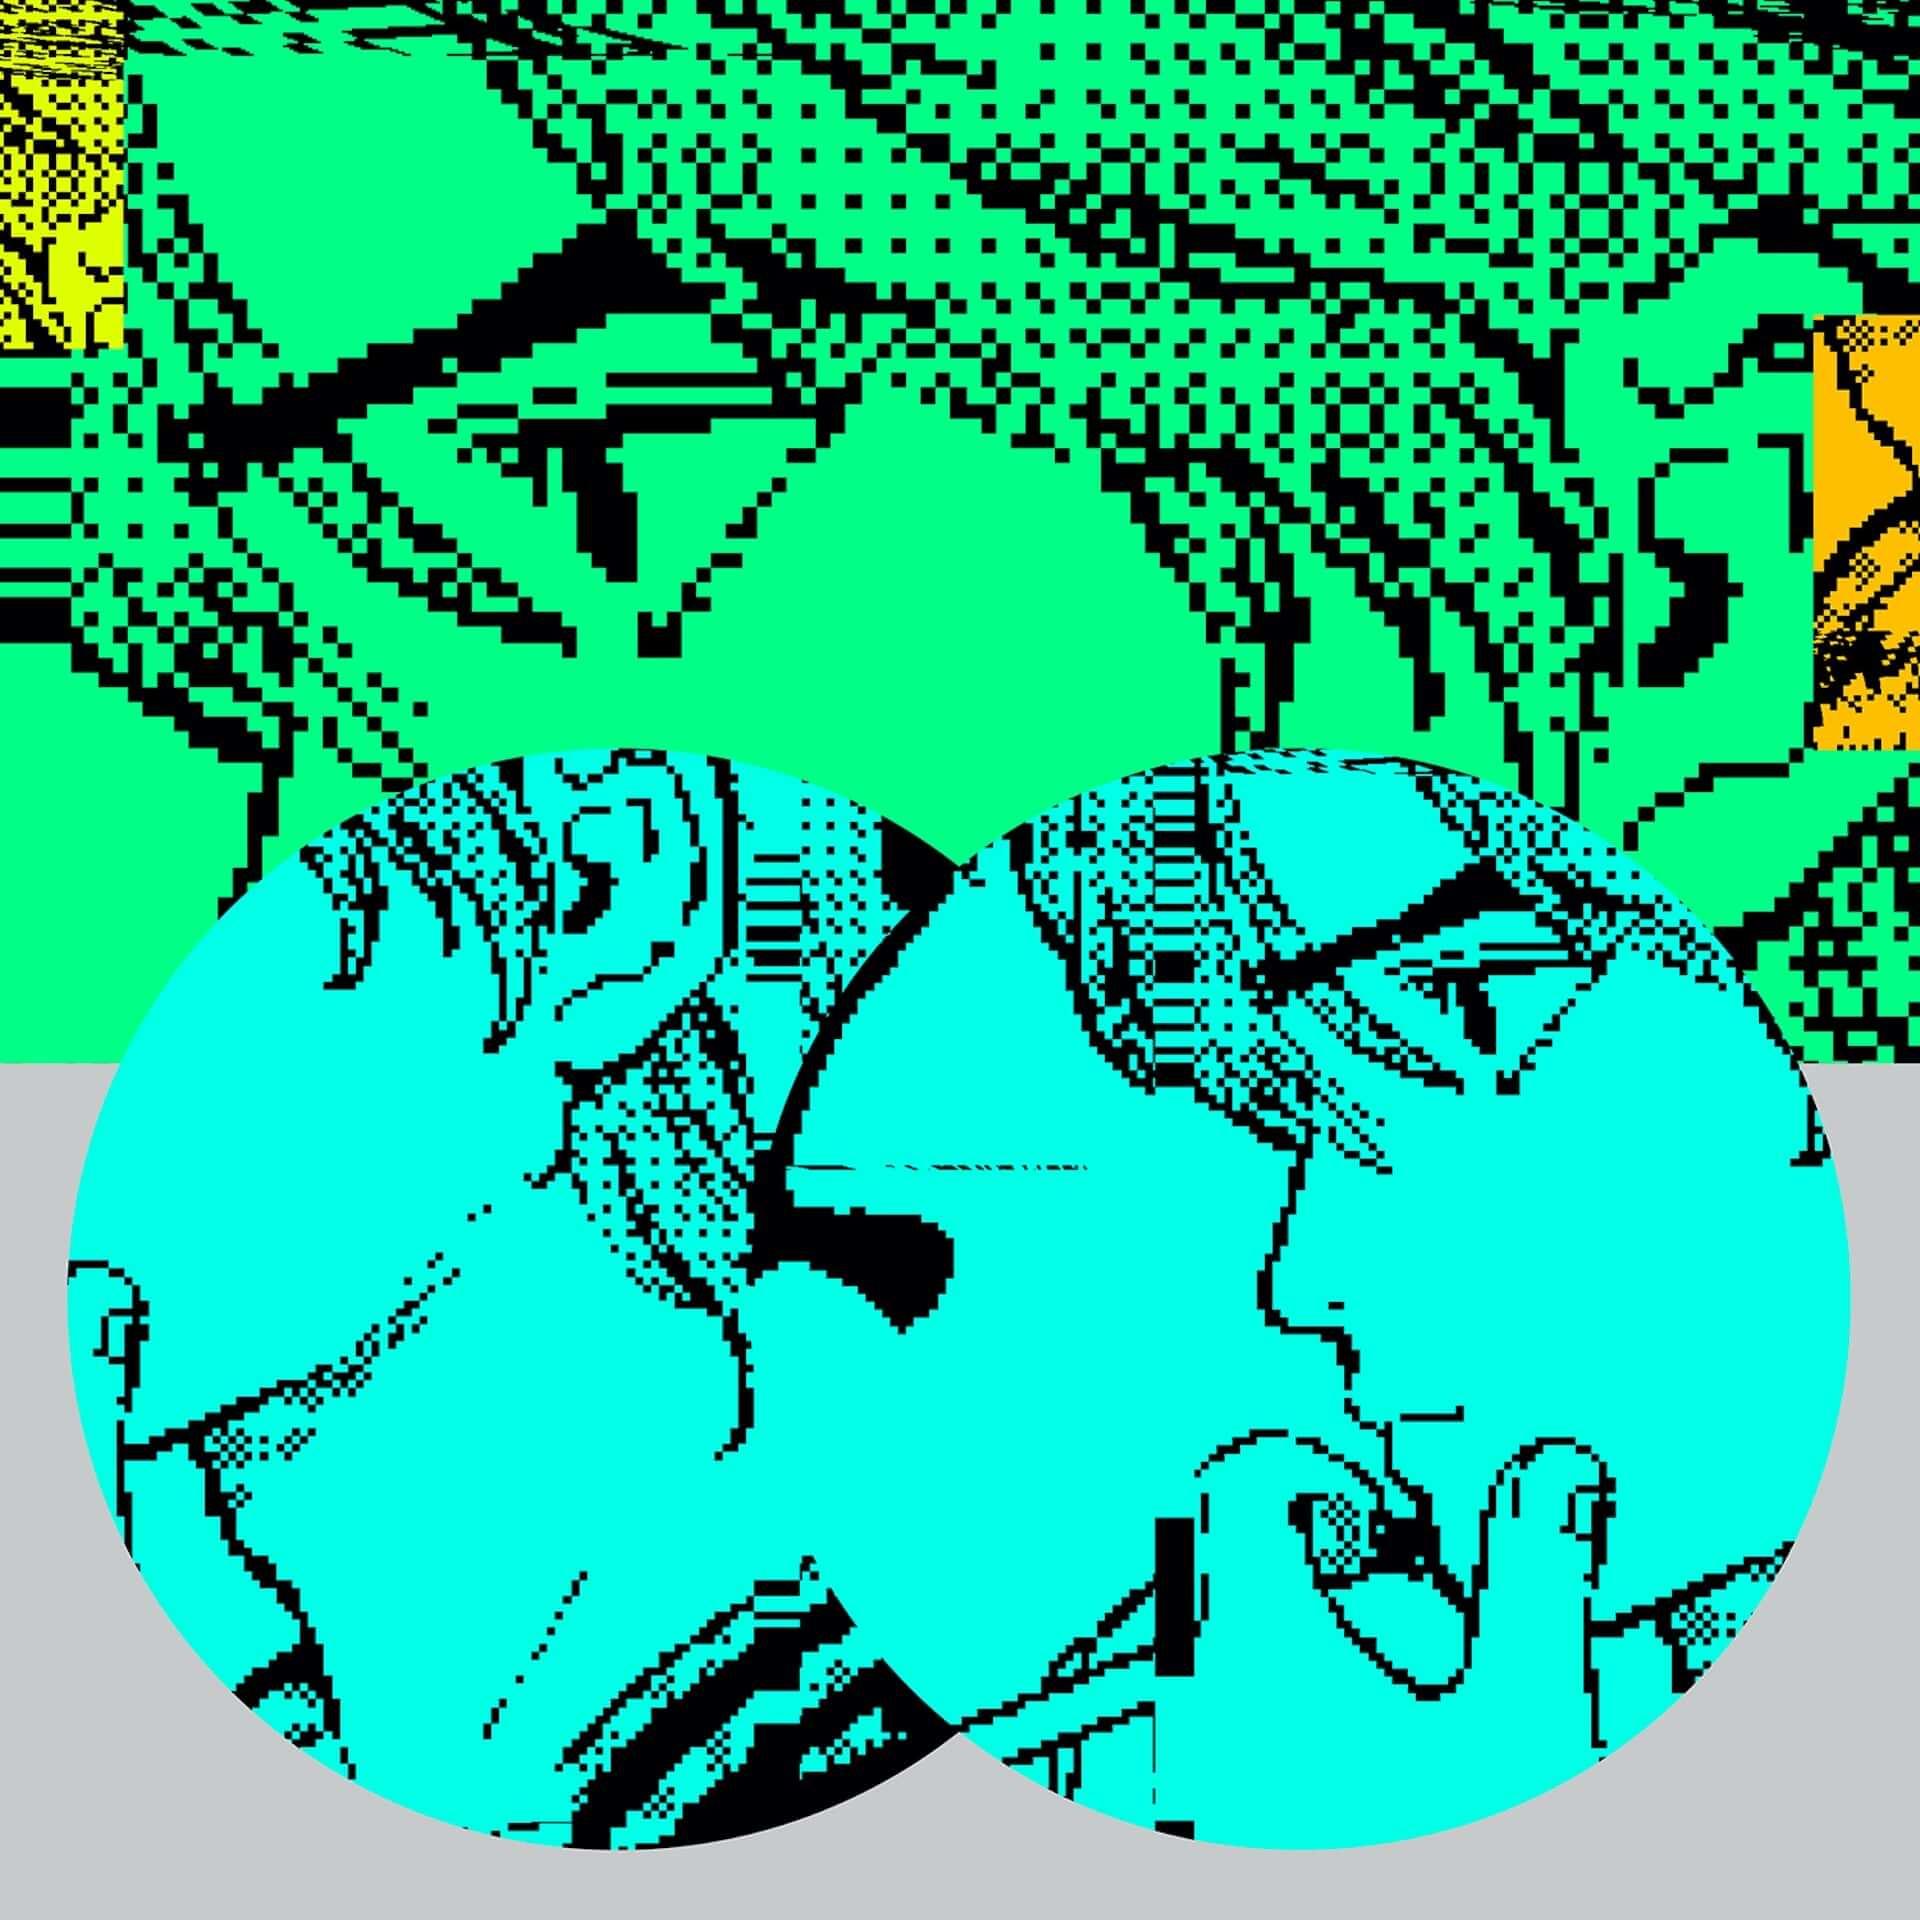 "tofubeatsが4thアルバムのリミックス集『RUN REMIXES』をリリース!リード曲""RUN REMIX (feat. KREVA & VaVa)""のMVも公開 music200904_tofubeats_2-1920x1920"